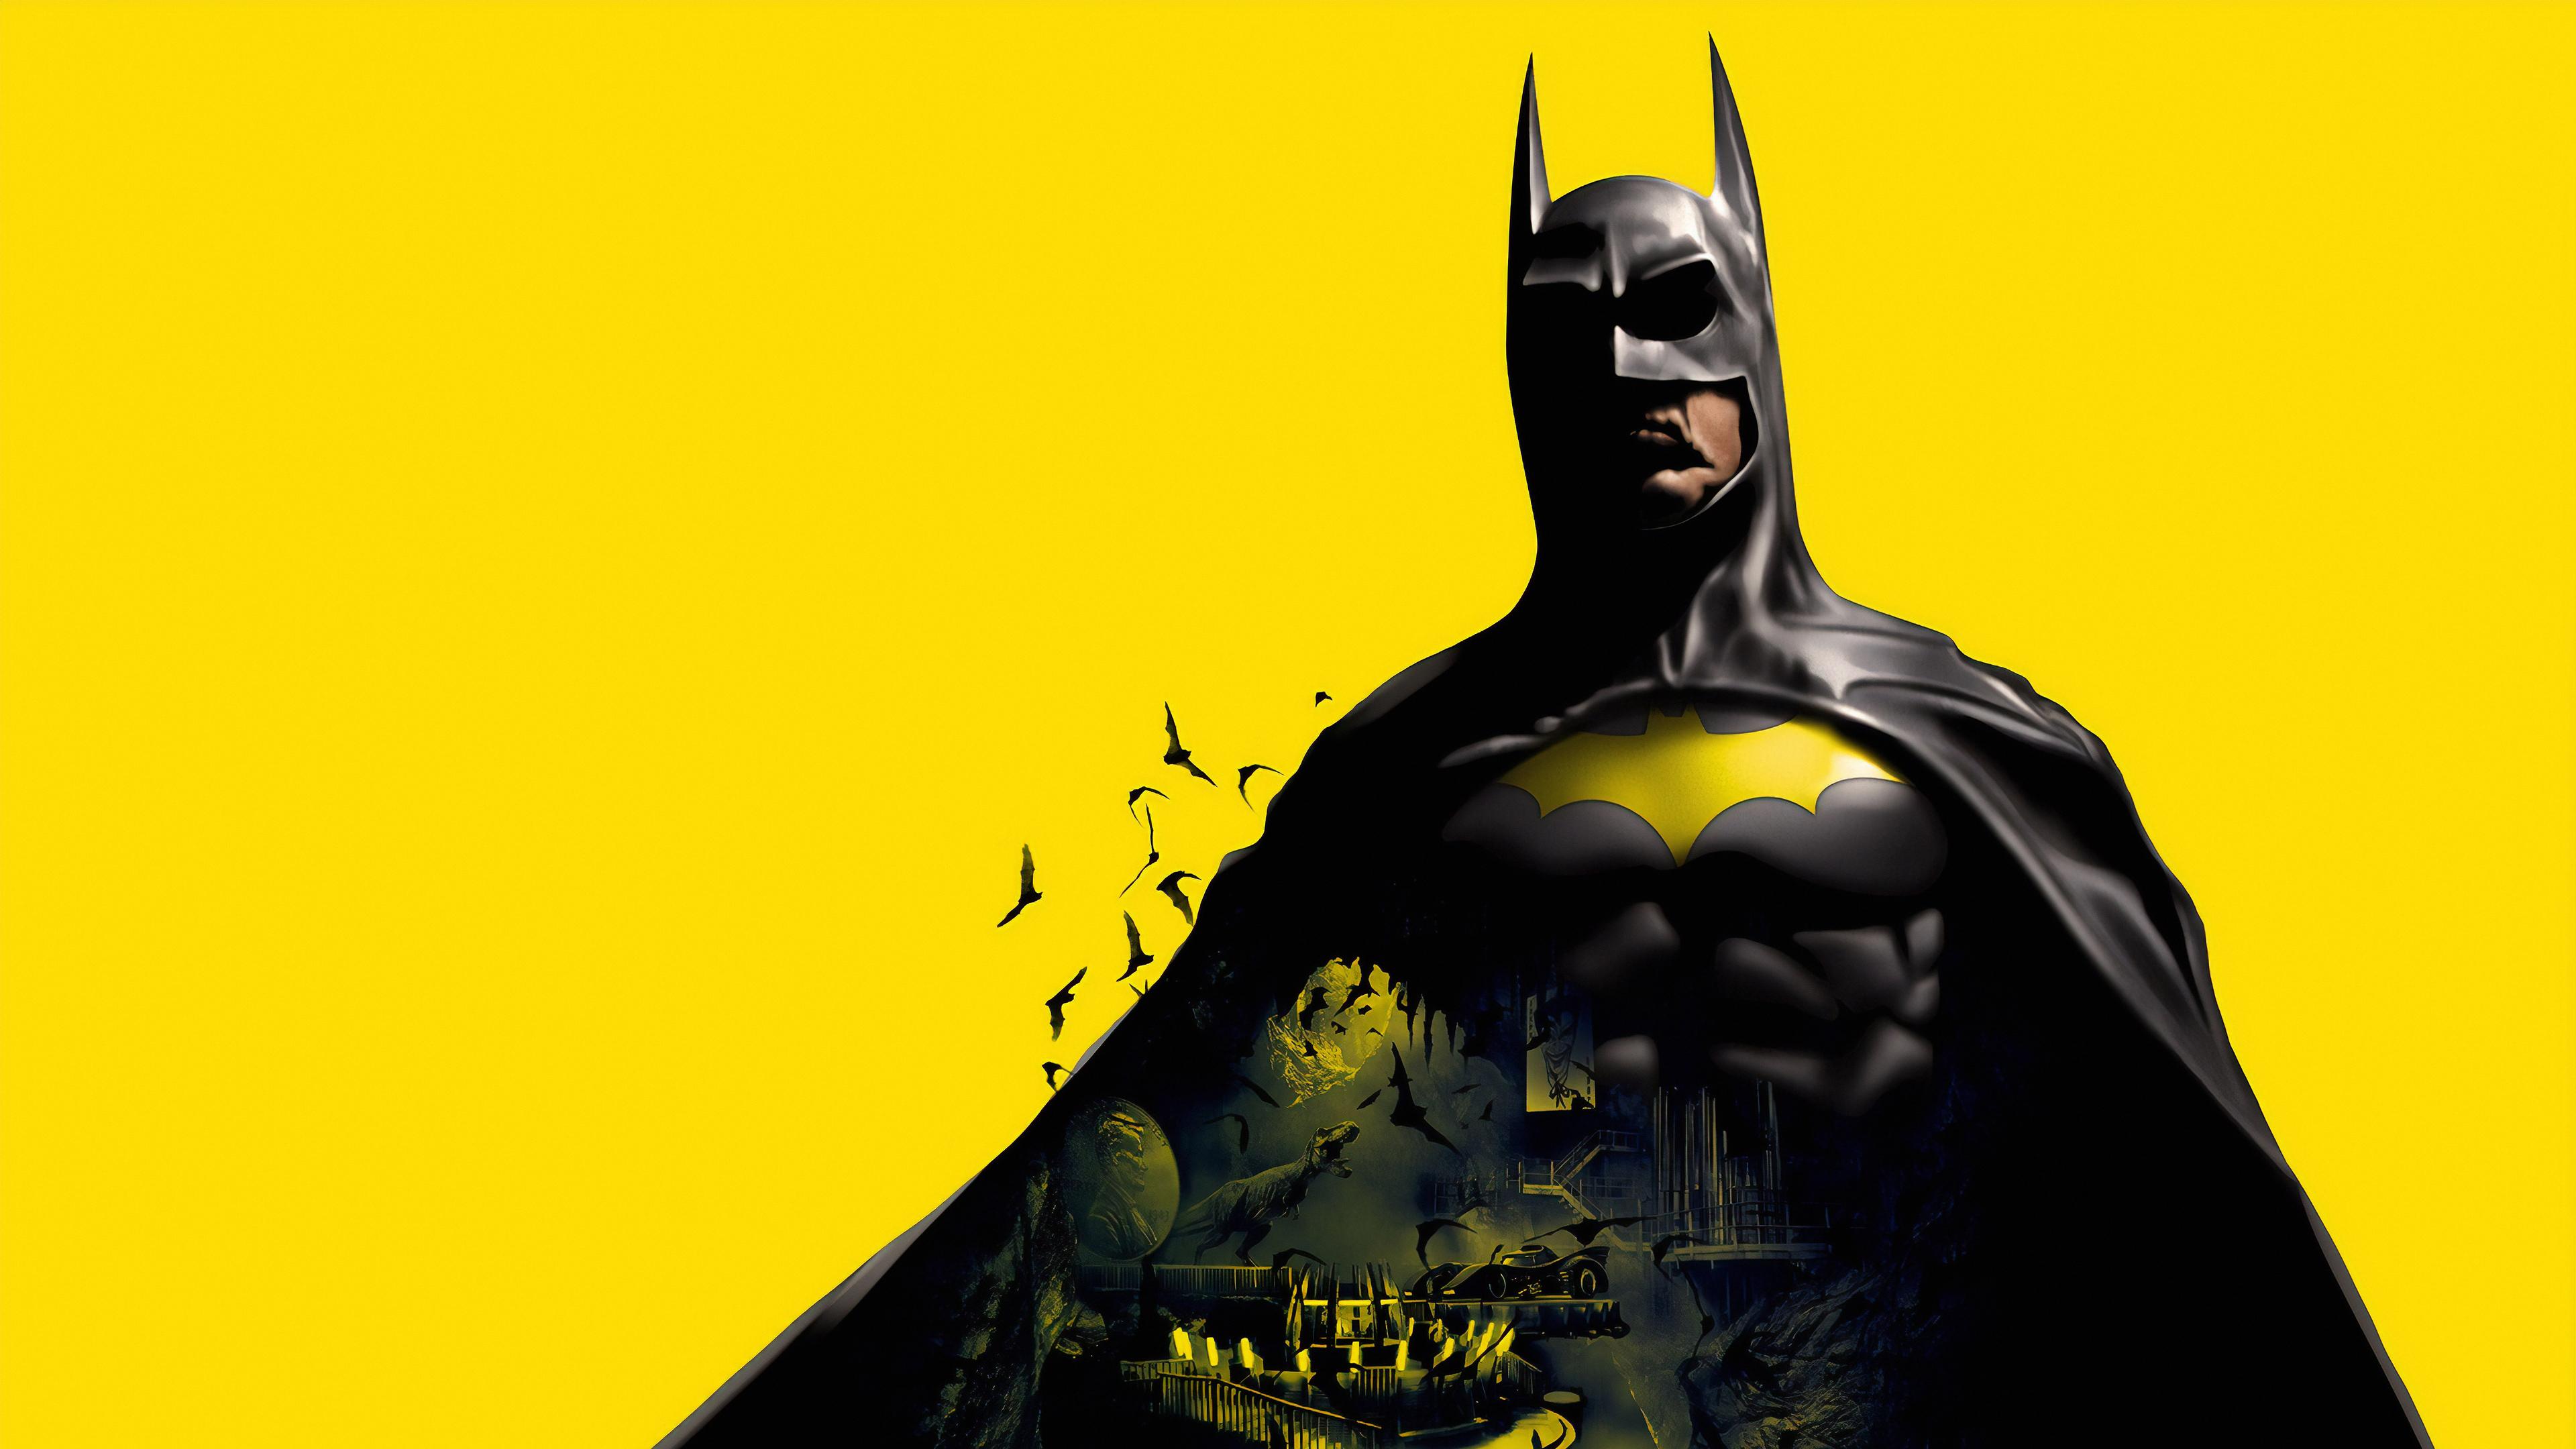 batman yellow background 1572368685 - Batman Yellow Background - superheroes wallpapers, hd-wallpapers, digital art wallpapers, batman wallpapers, artwork wallpapers, 4k-wallpapers